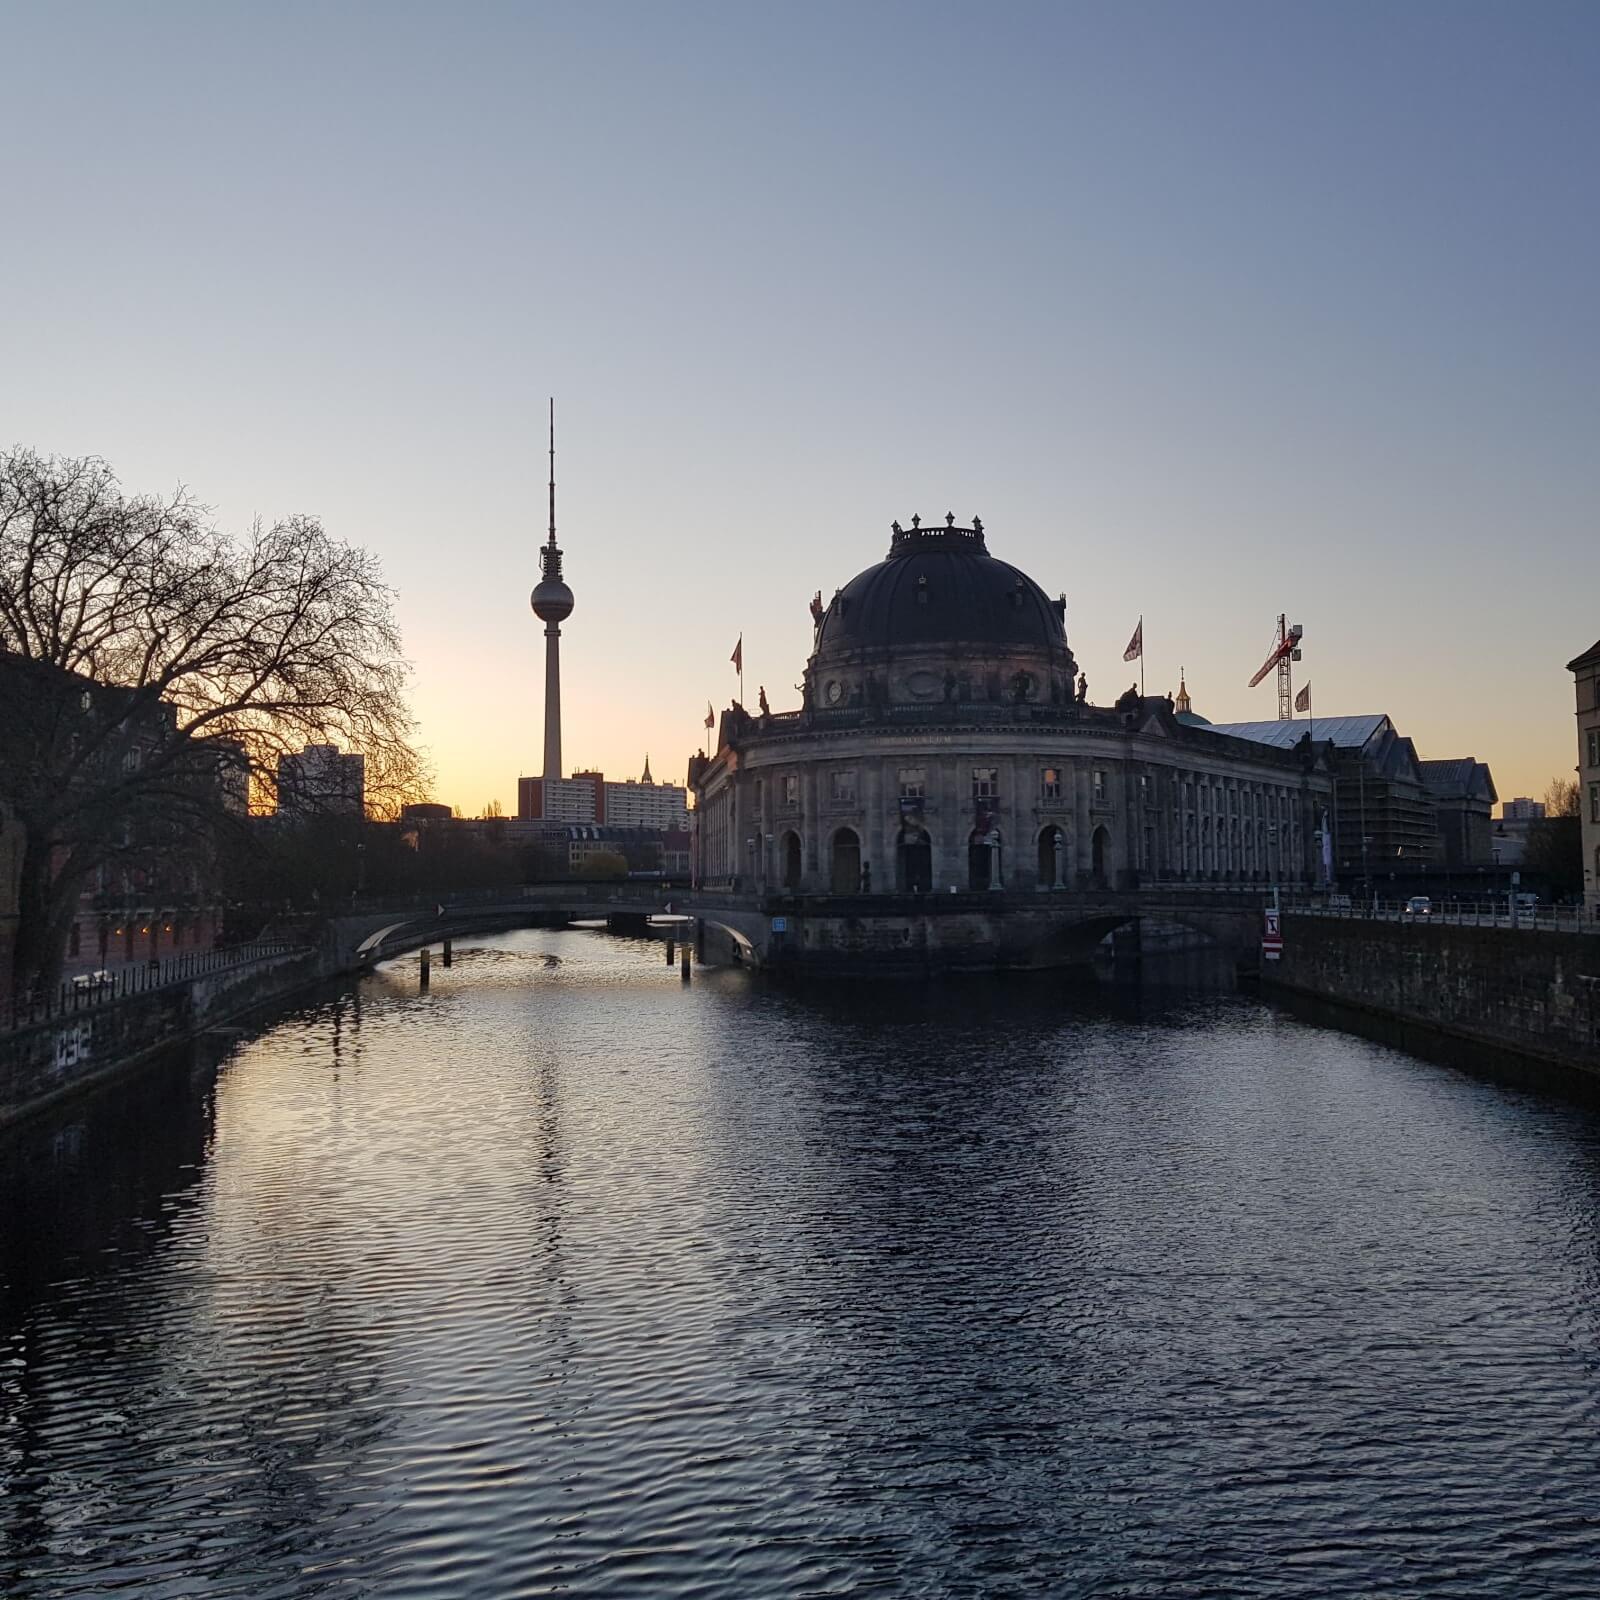 Sonnenaufgang Museumsinsel Berlin